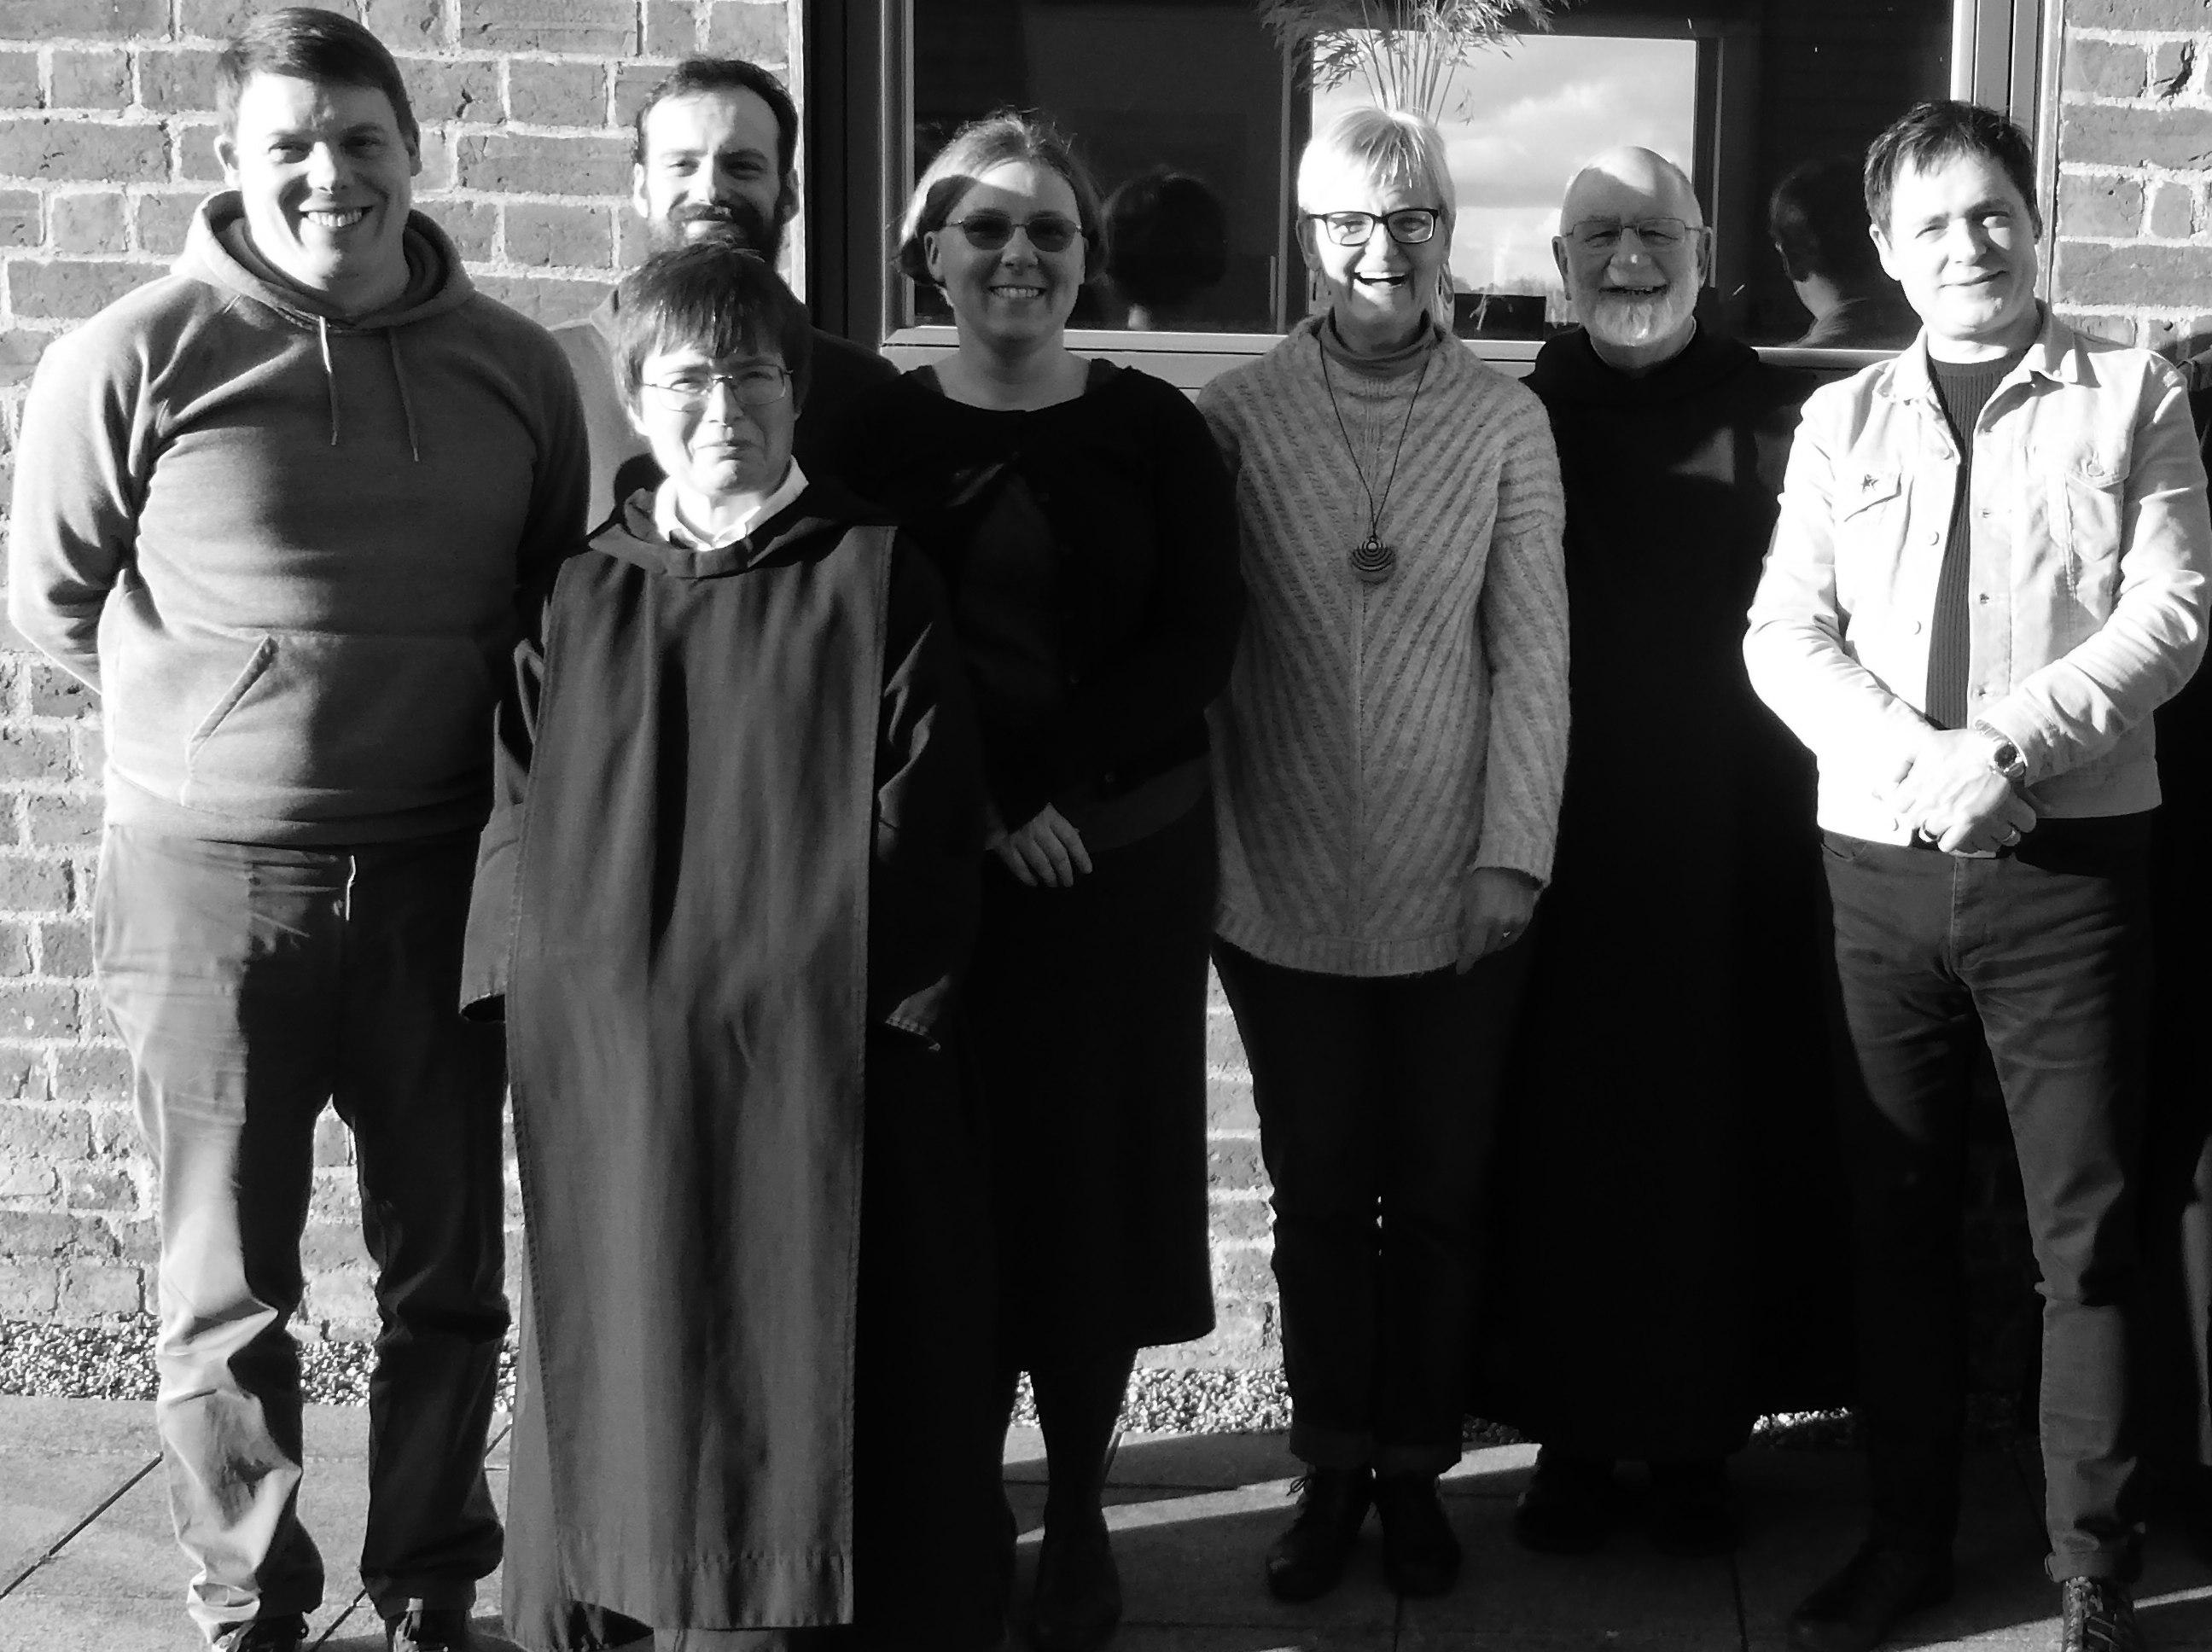 New/Trad Monastics